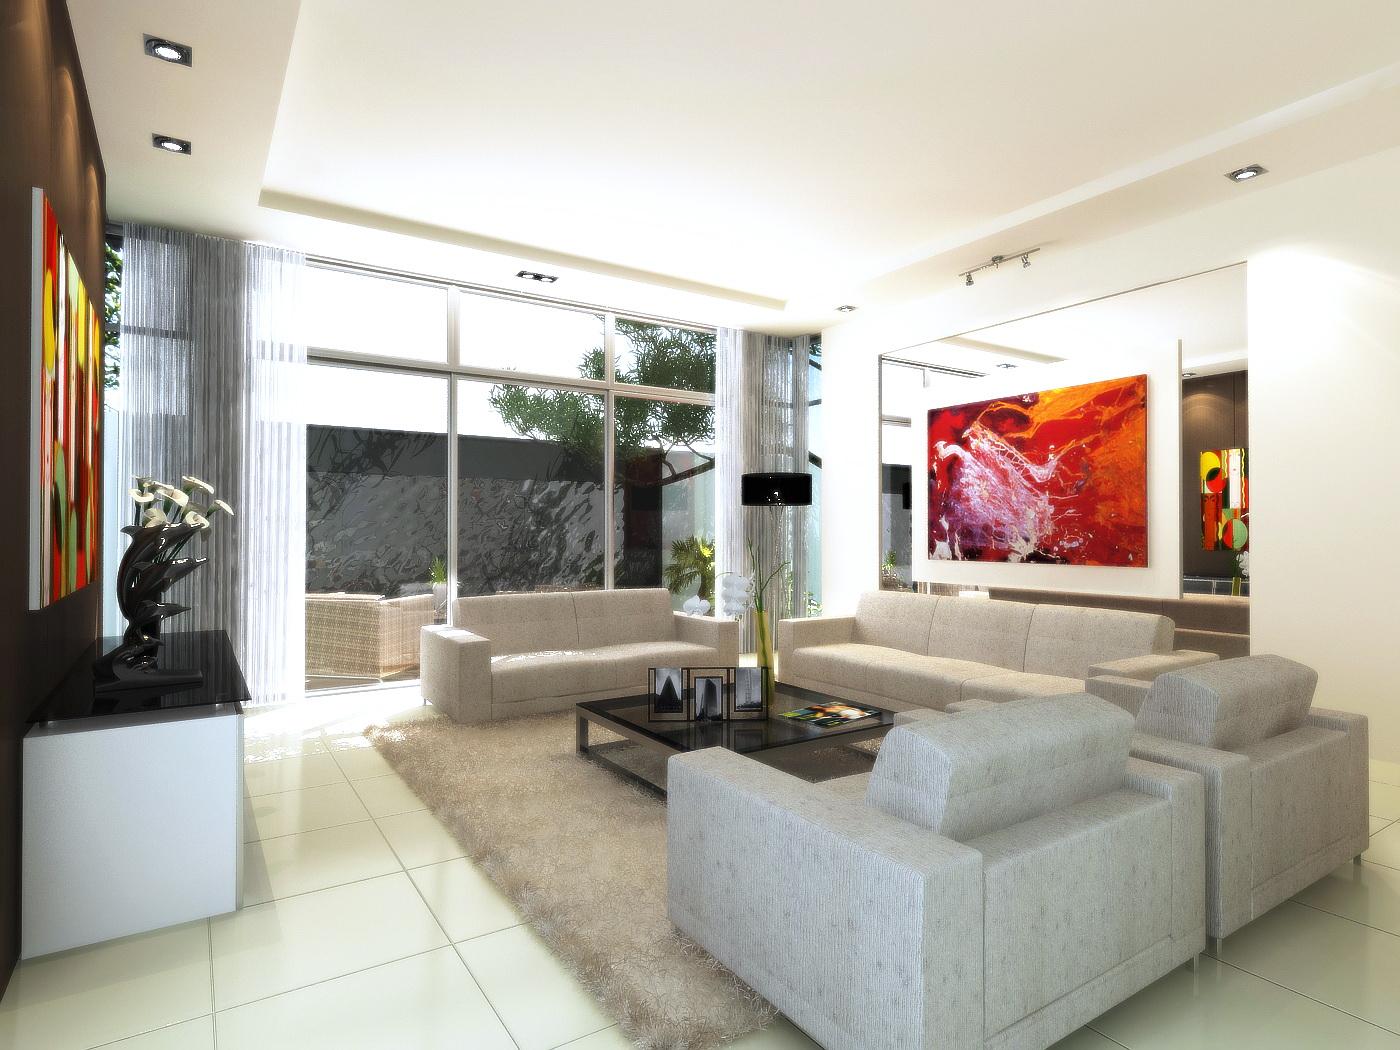 Living Hall for KLG by rockrockzai on DeviantArt